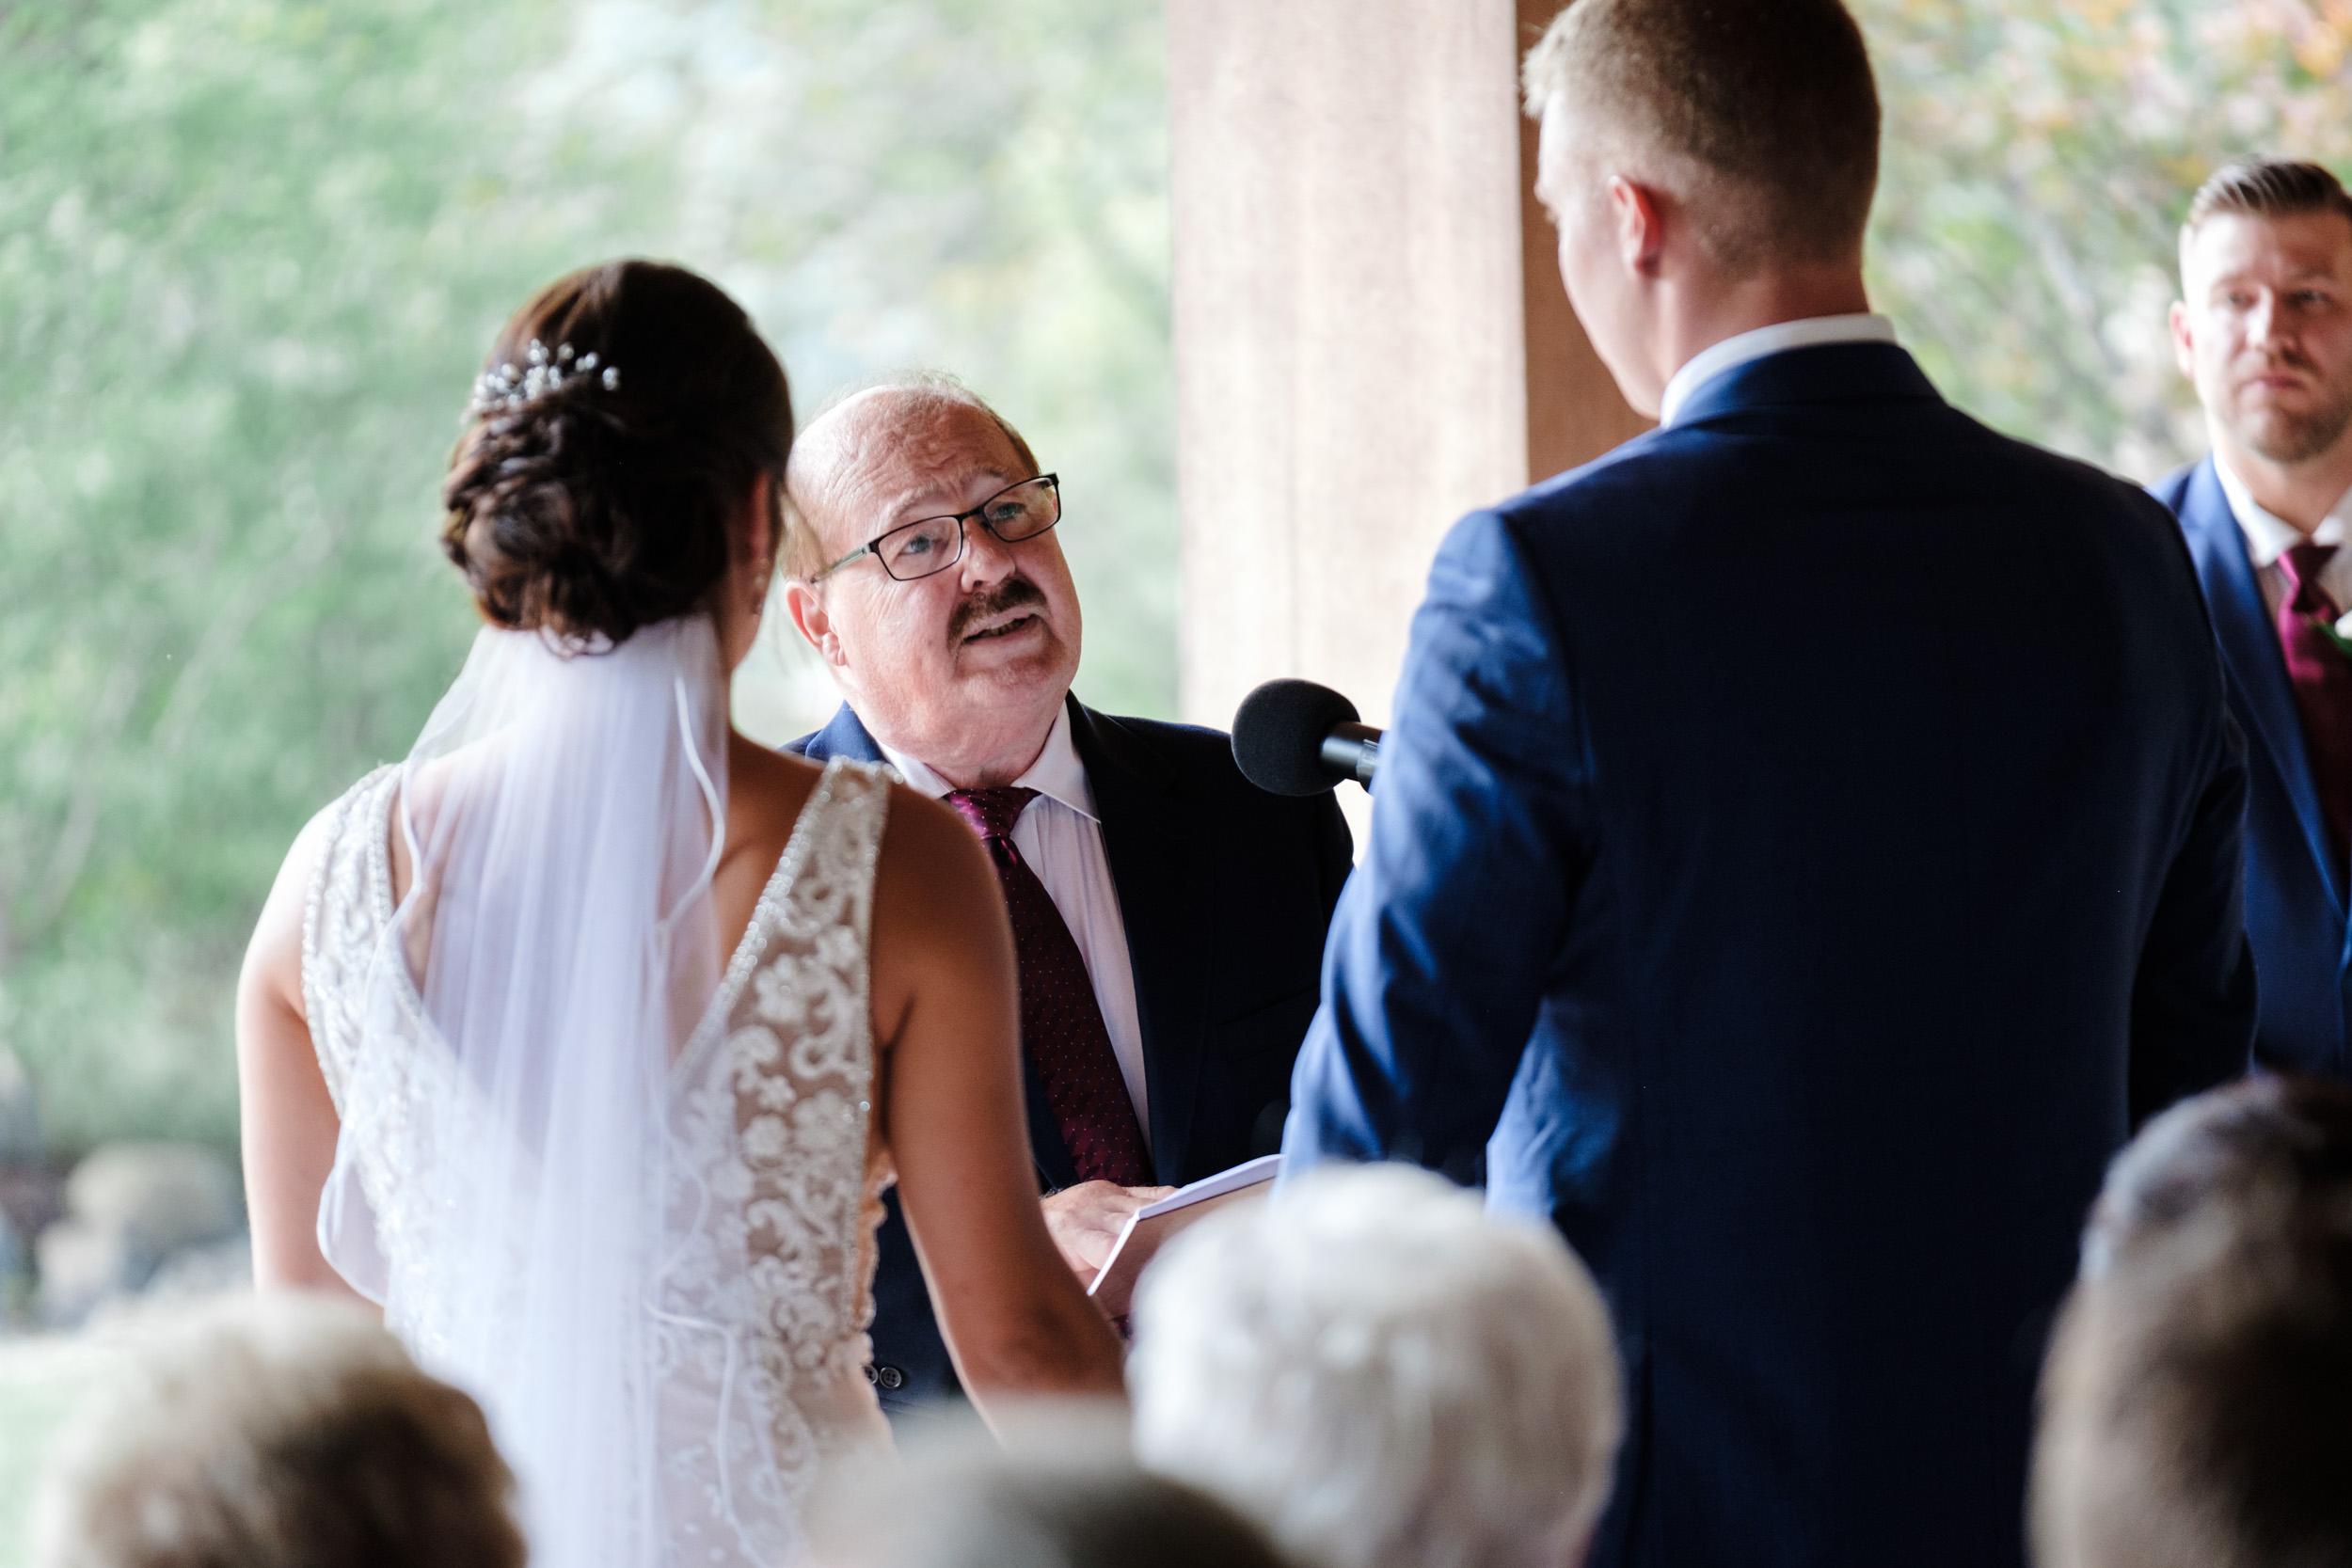 18-09-01 BAP Kiley-Trevor-Anderson-Gardens-Wedding-33.jpg